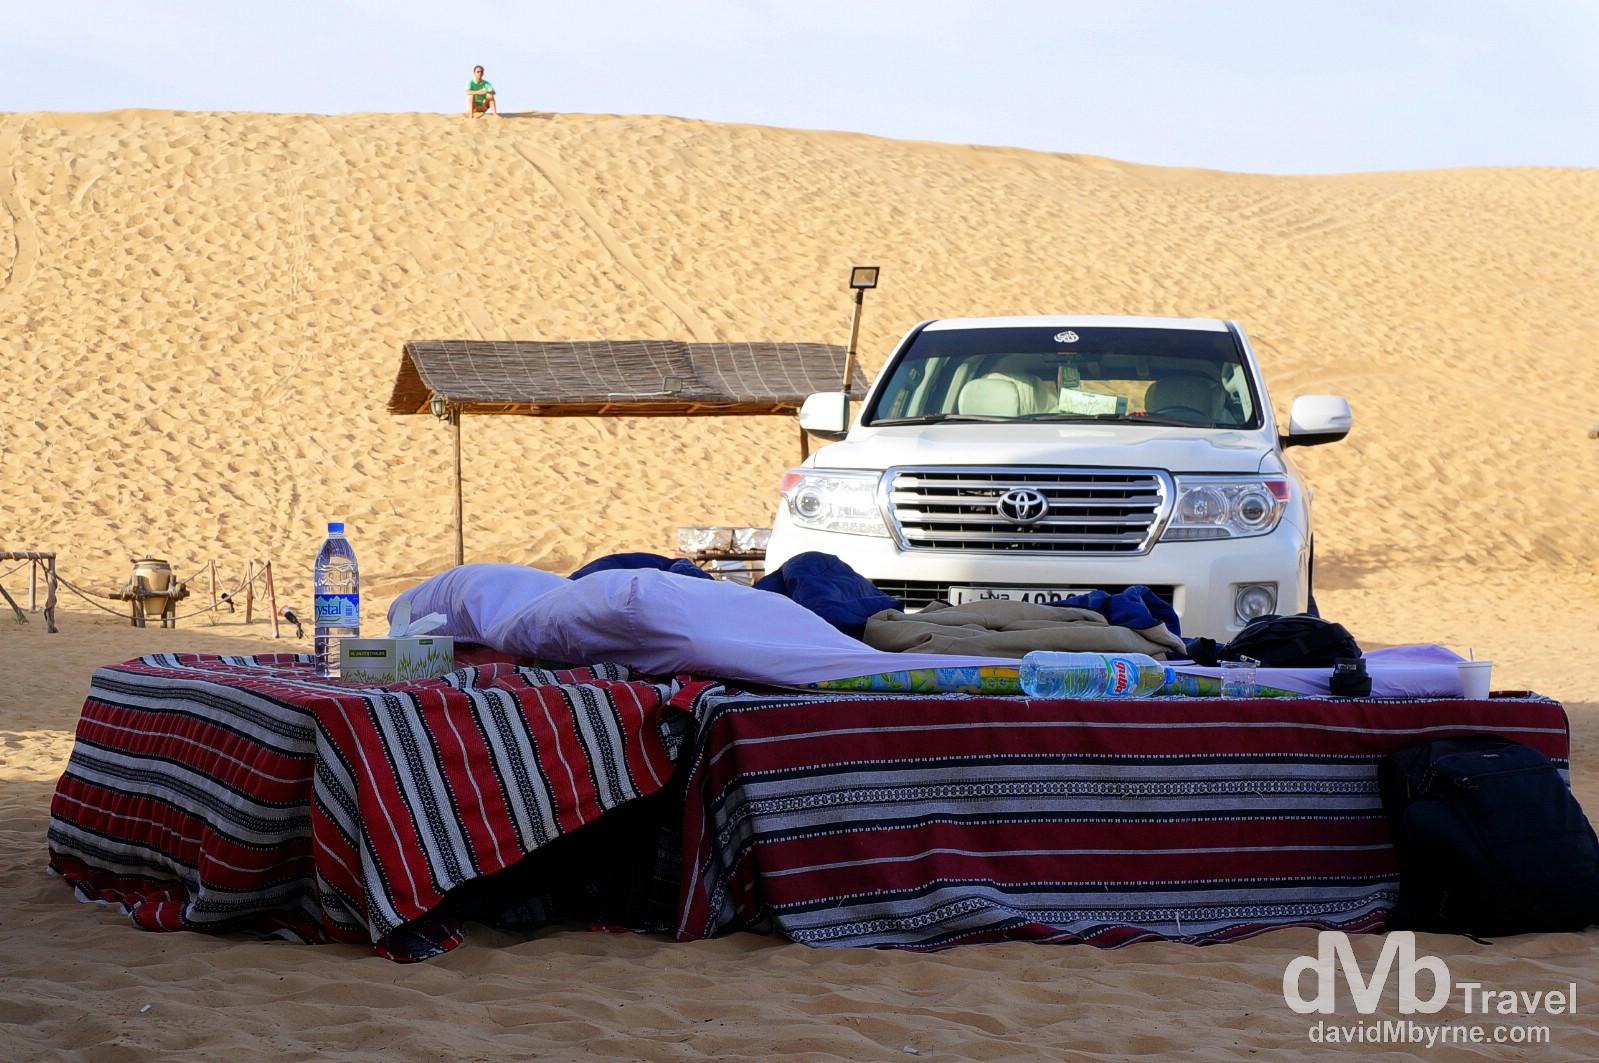 North Tours Desert Camp outside Dubai, UAE. April 18th, 2014.